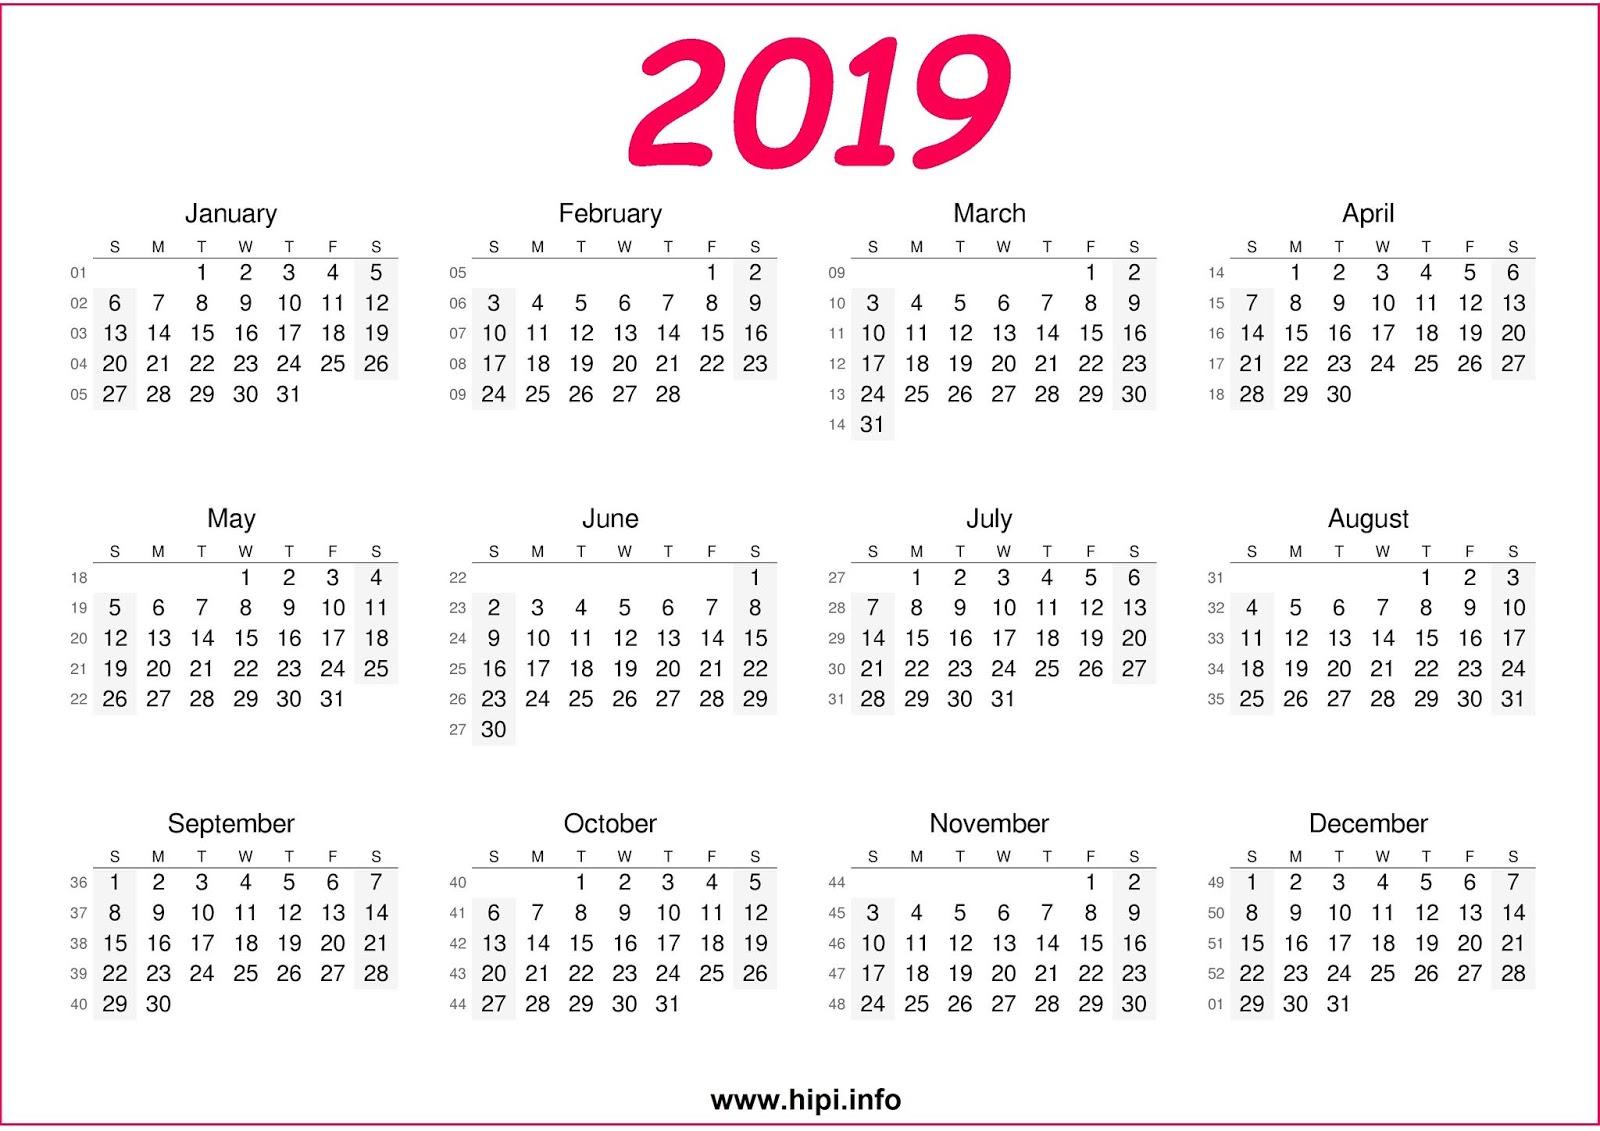 calendar 2019 free download a4 paper size 300 dpi